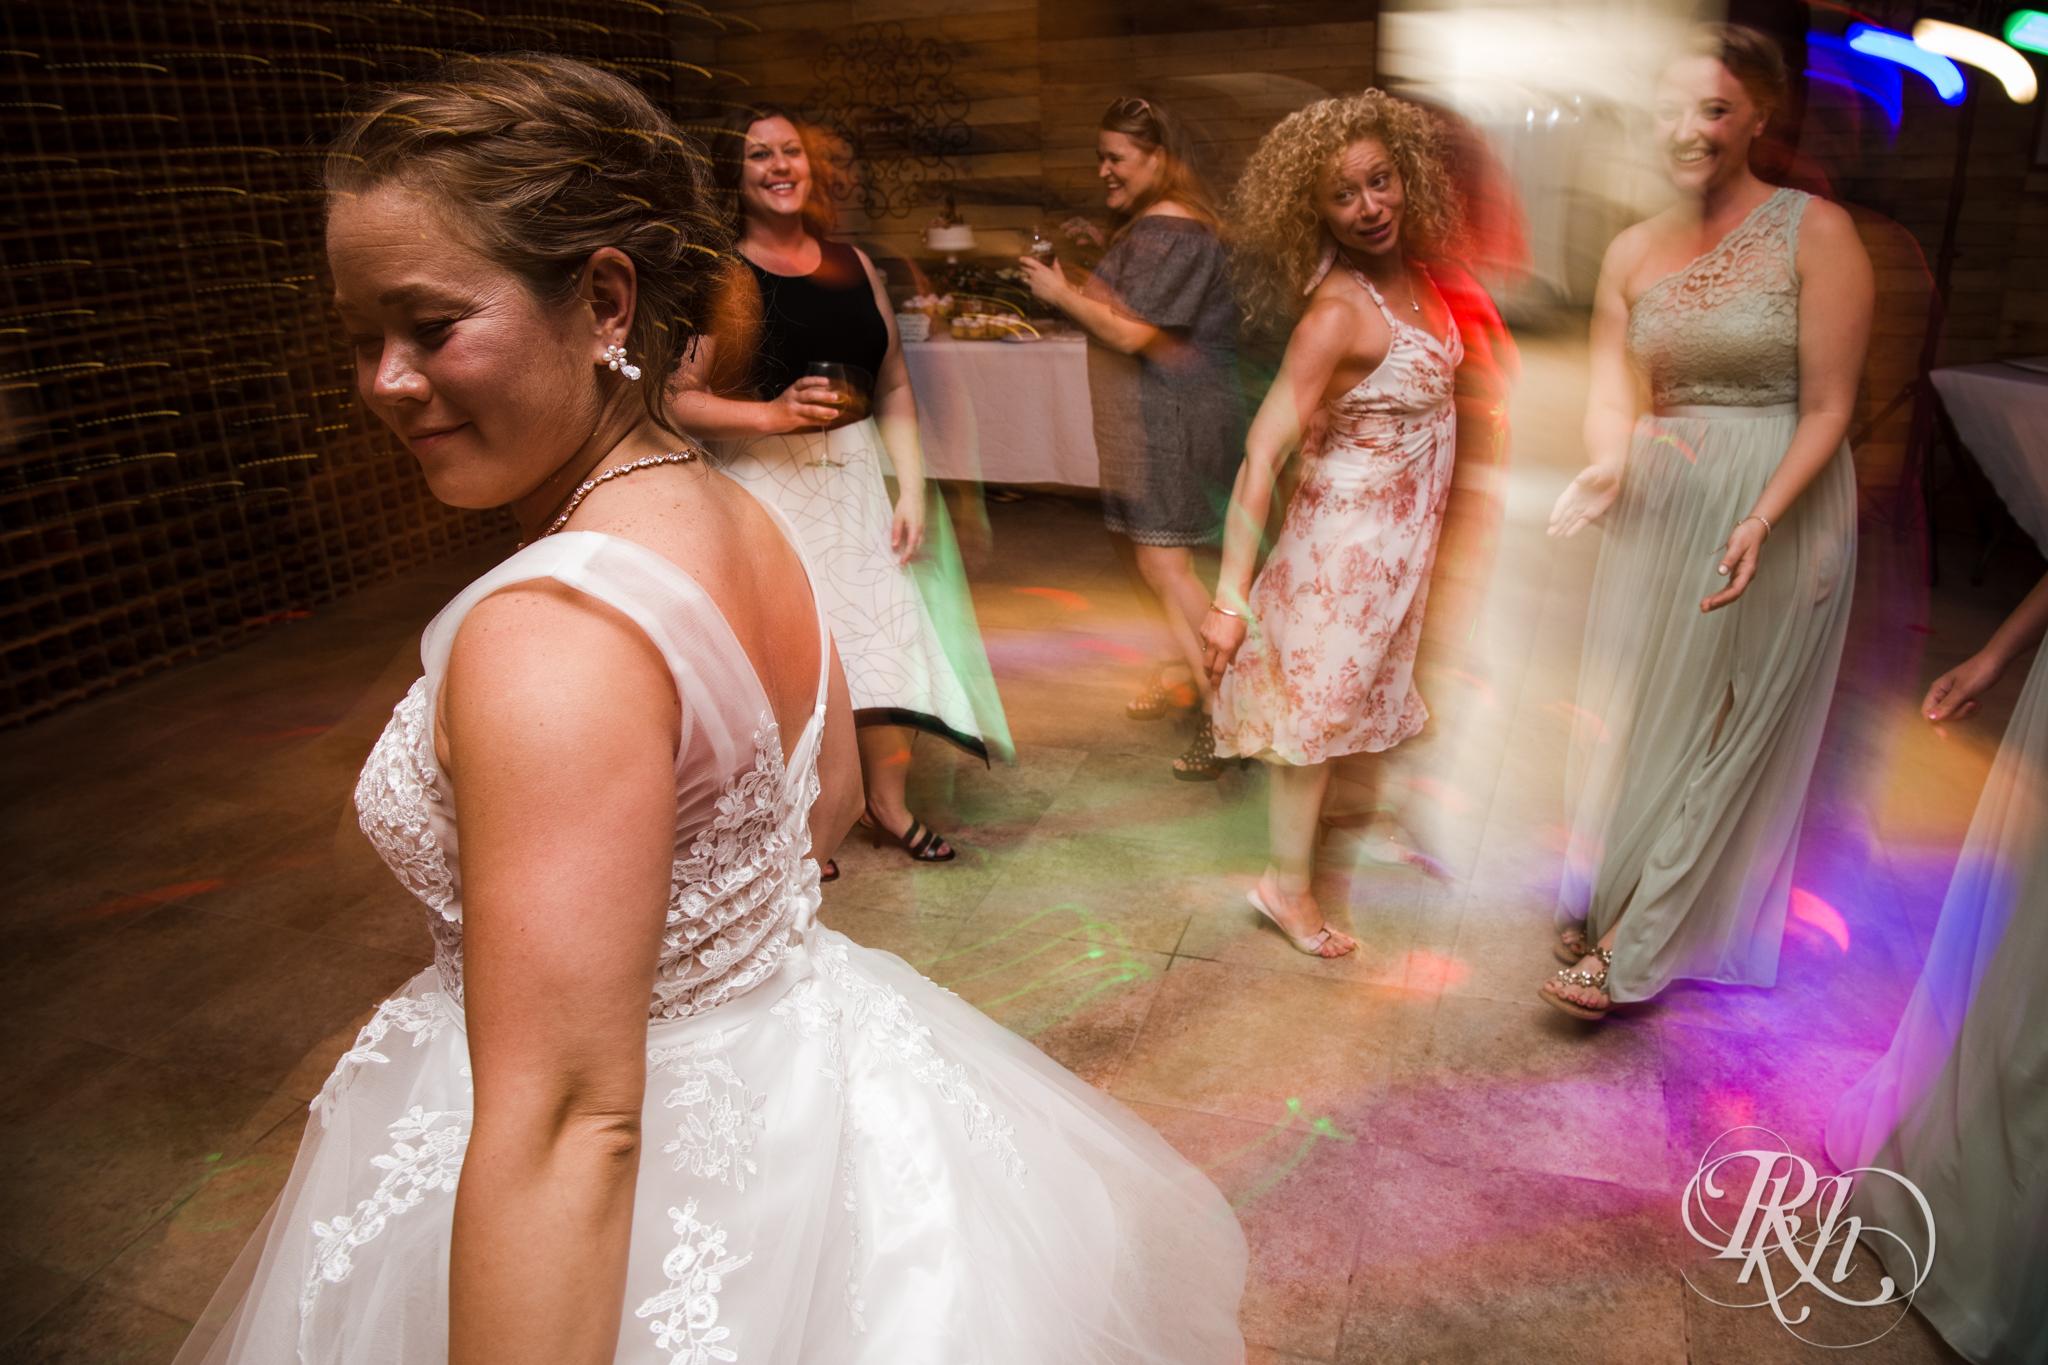 Ally & Nick - Minnesota Wedding Photography - Next Chapter Winery - RKH Images - Blog (51 of 57).jpg